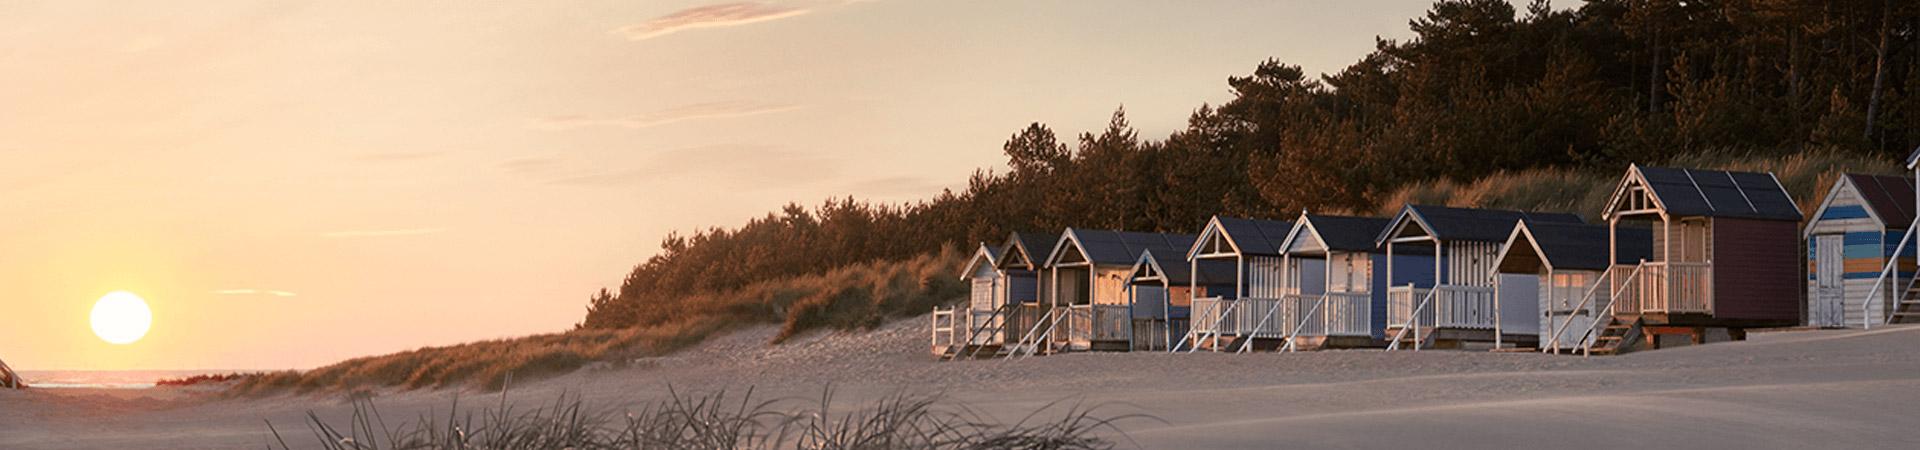 Beach Hut Woman